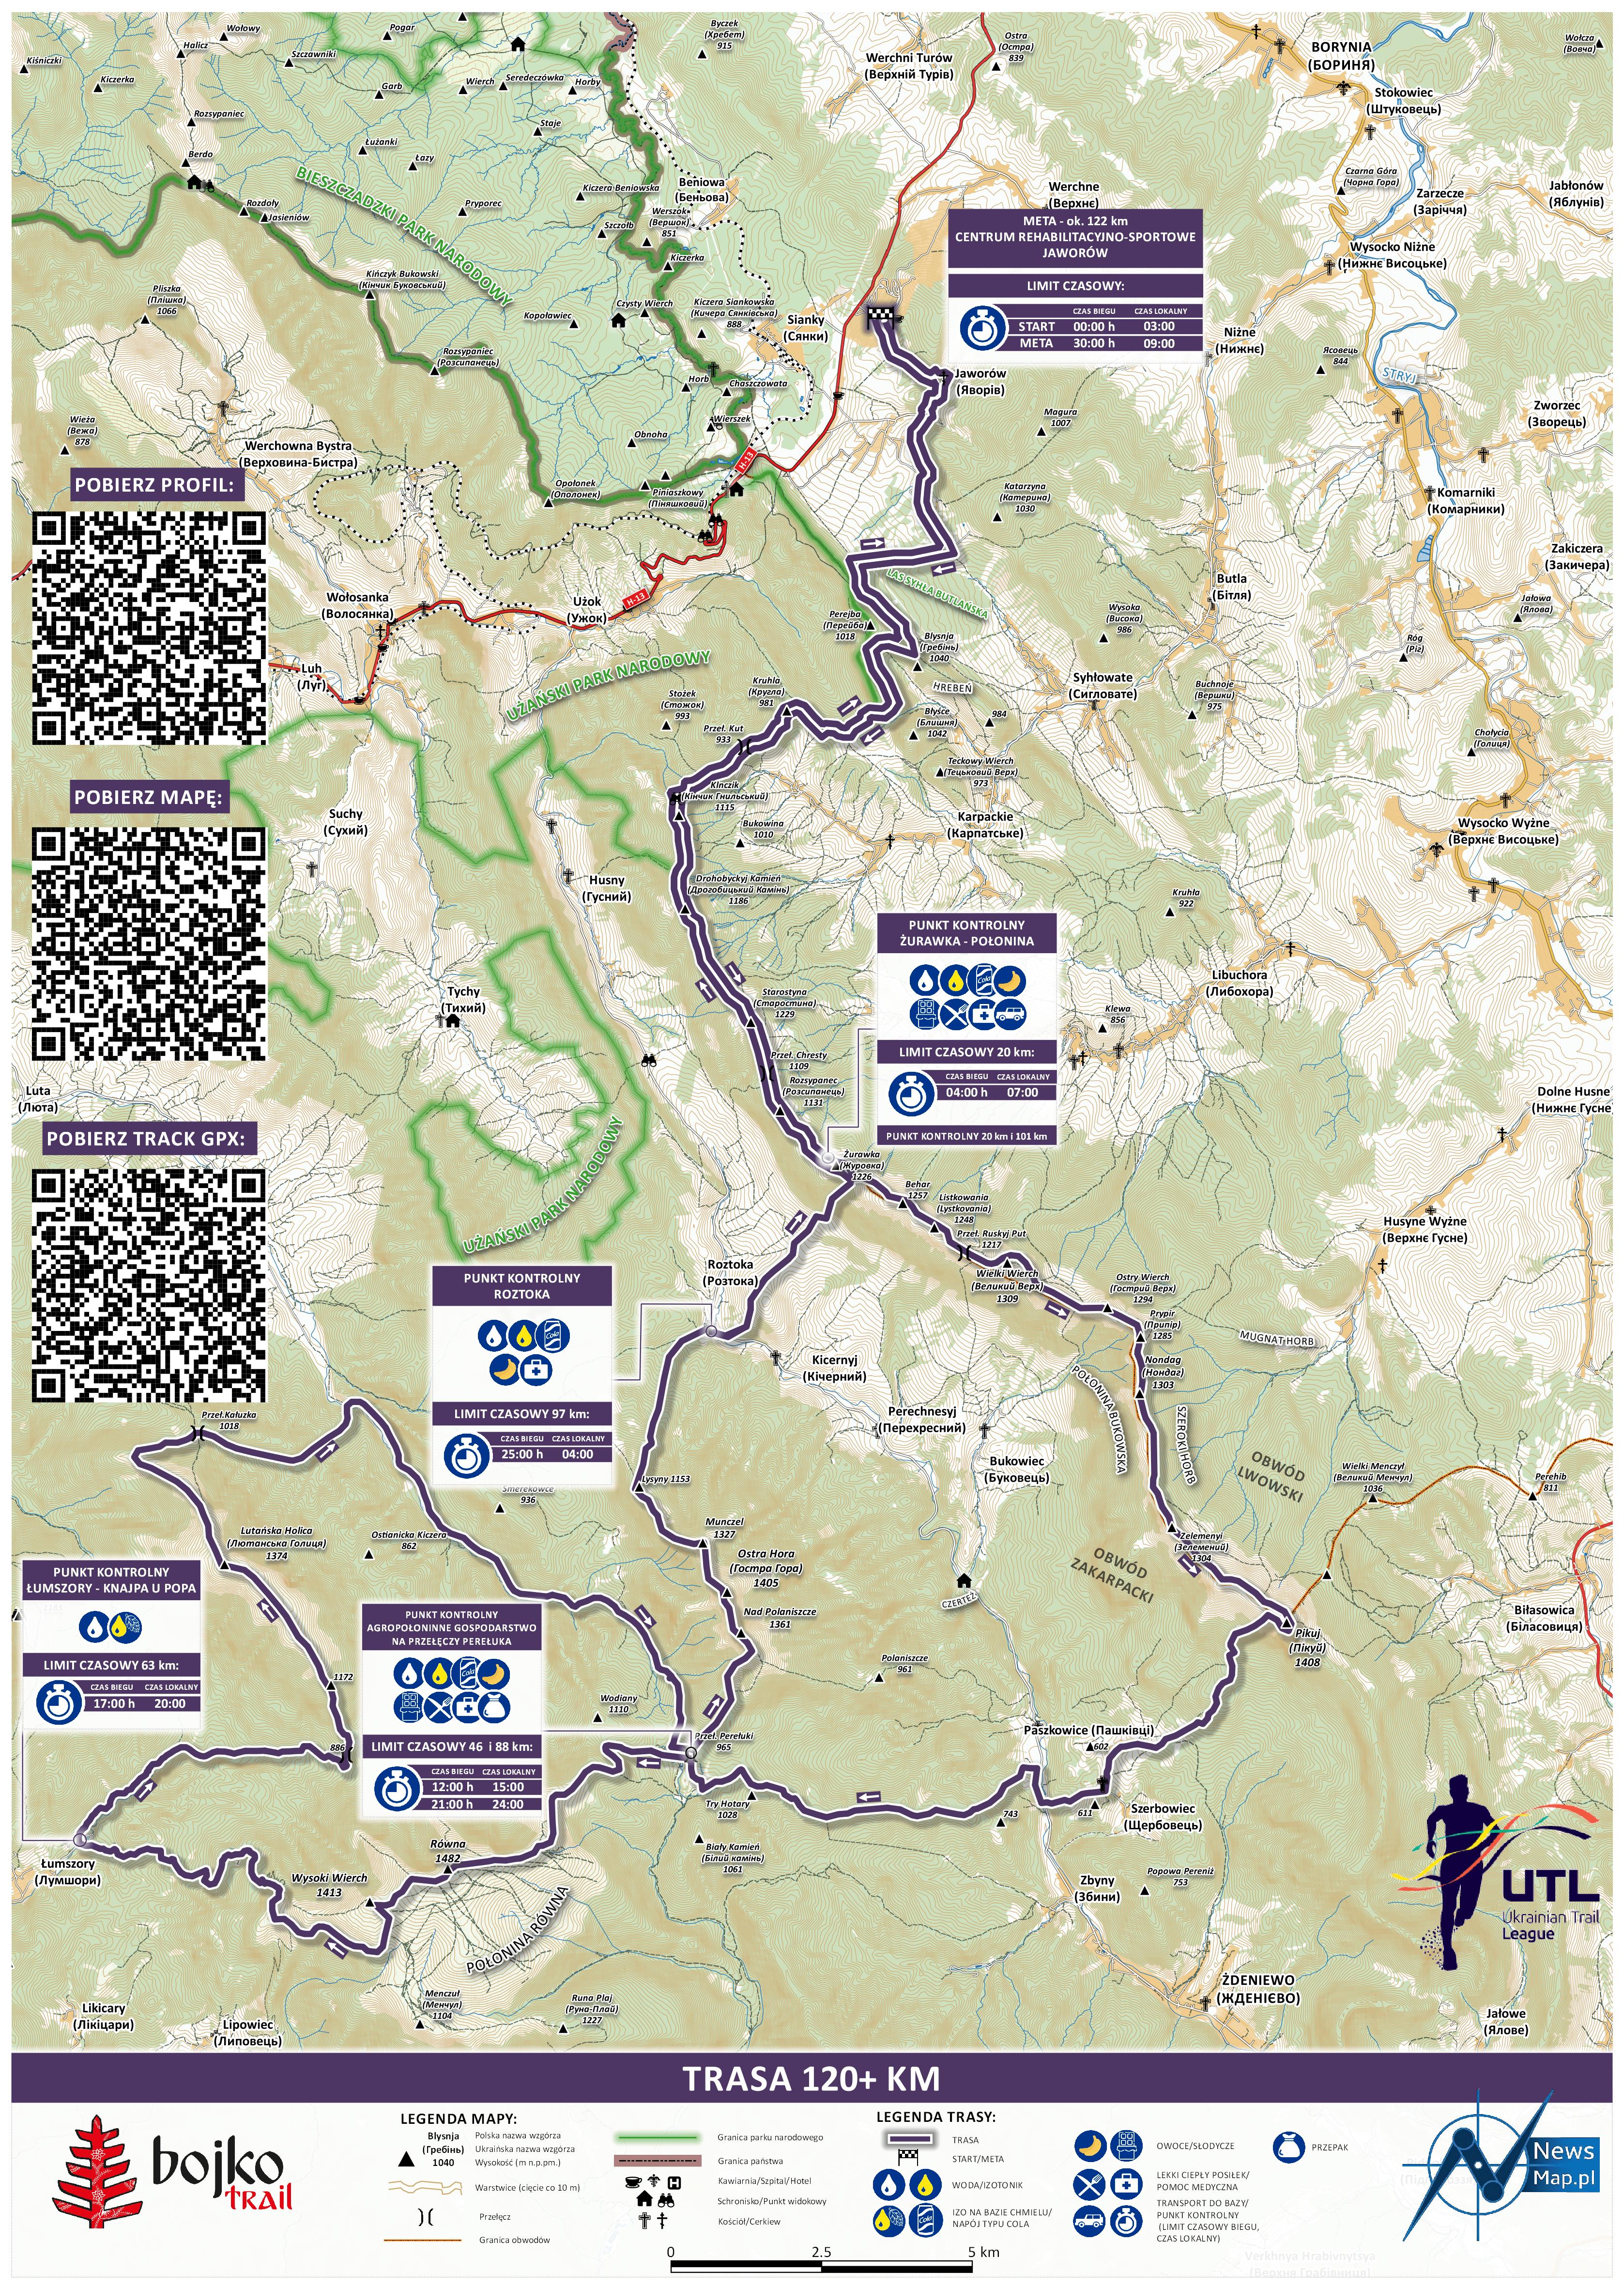 Bojko Trail +120